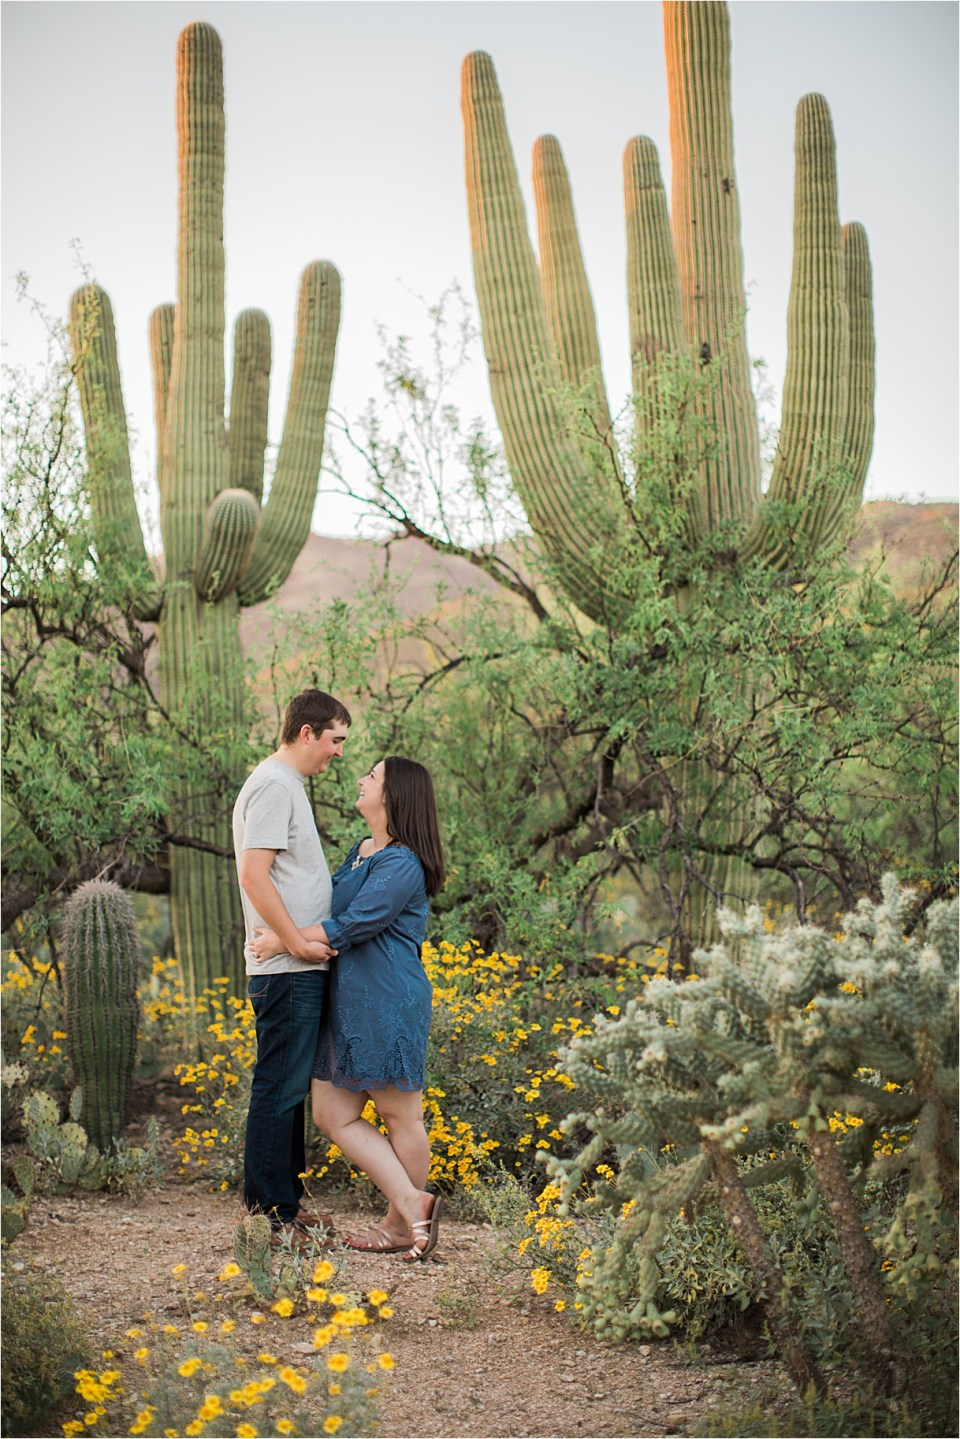 Desert engagement session in Tucson, Arizona.